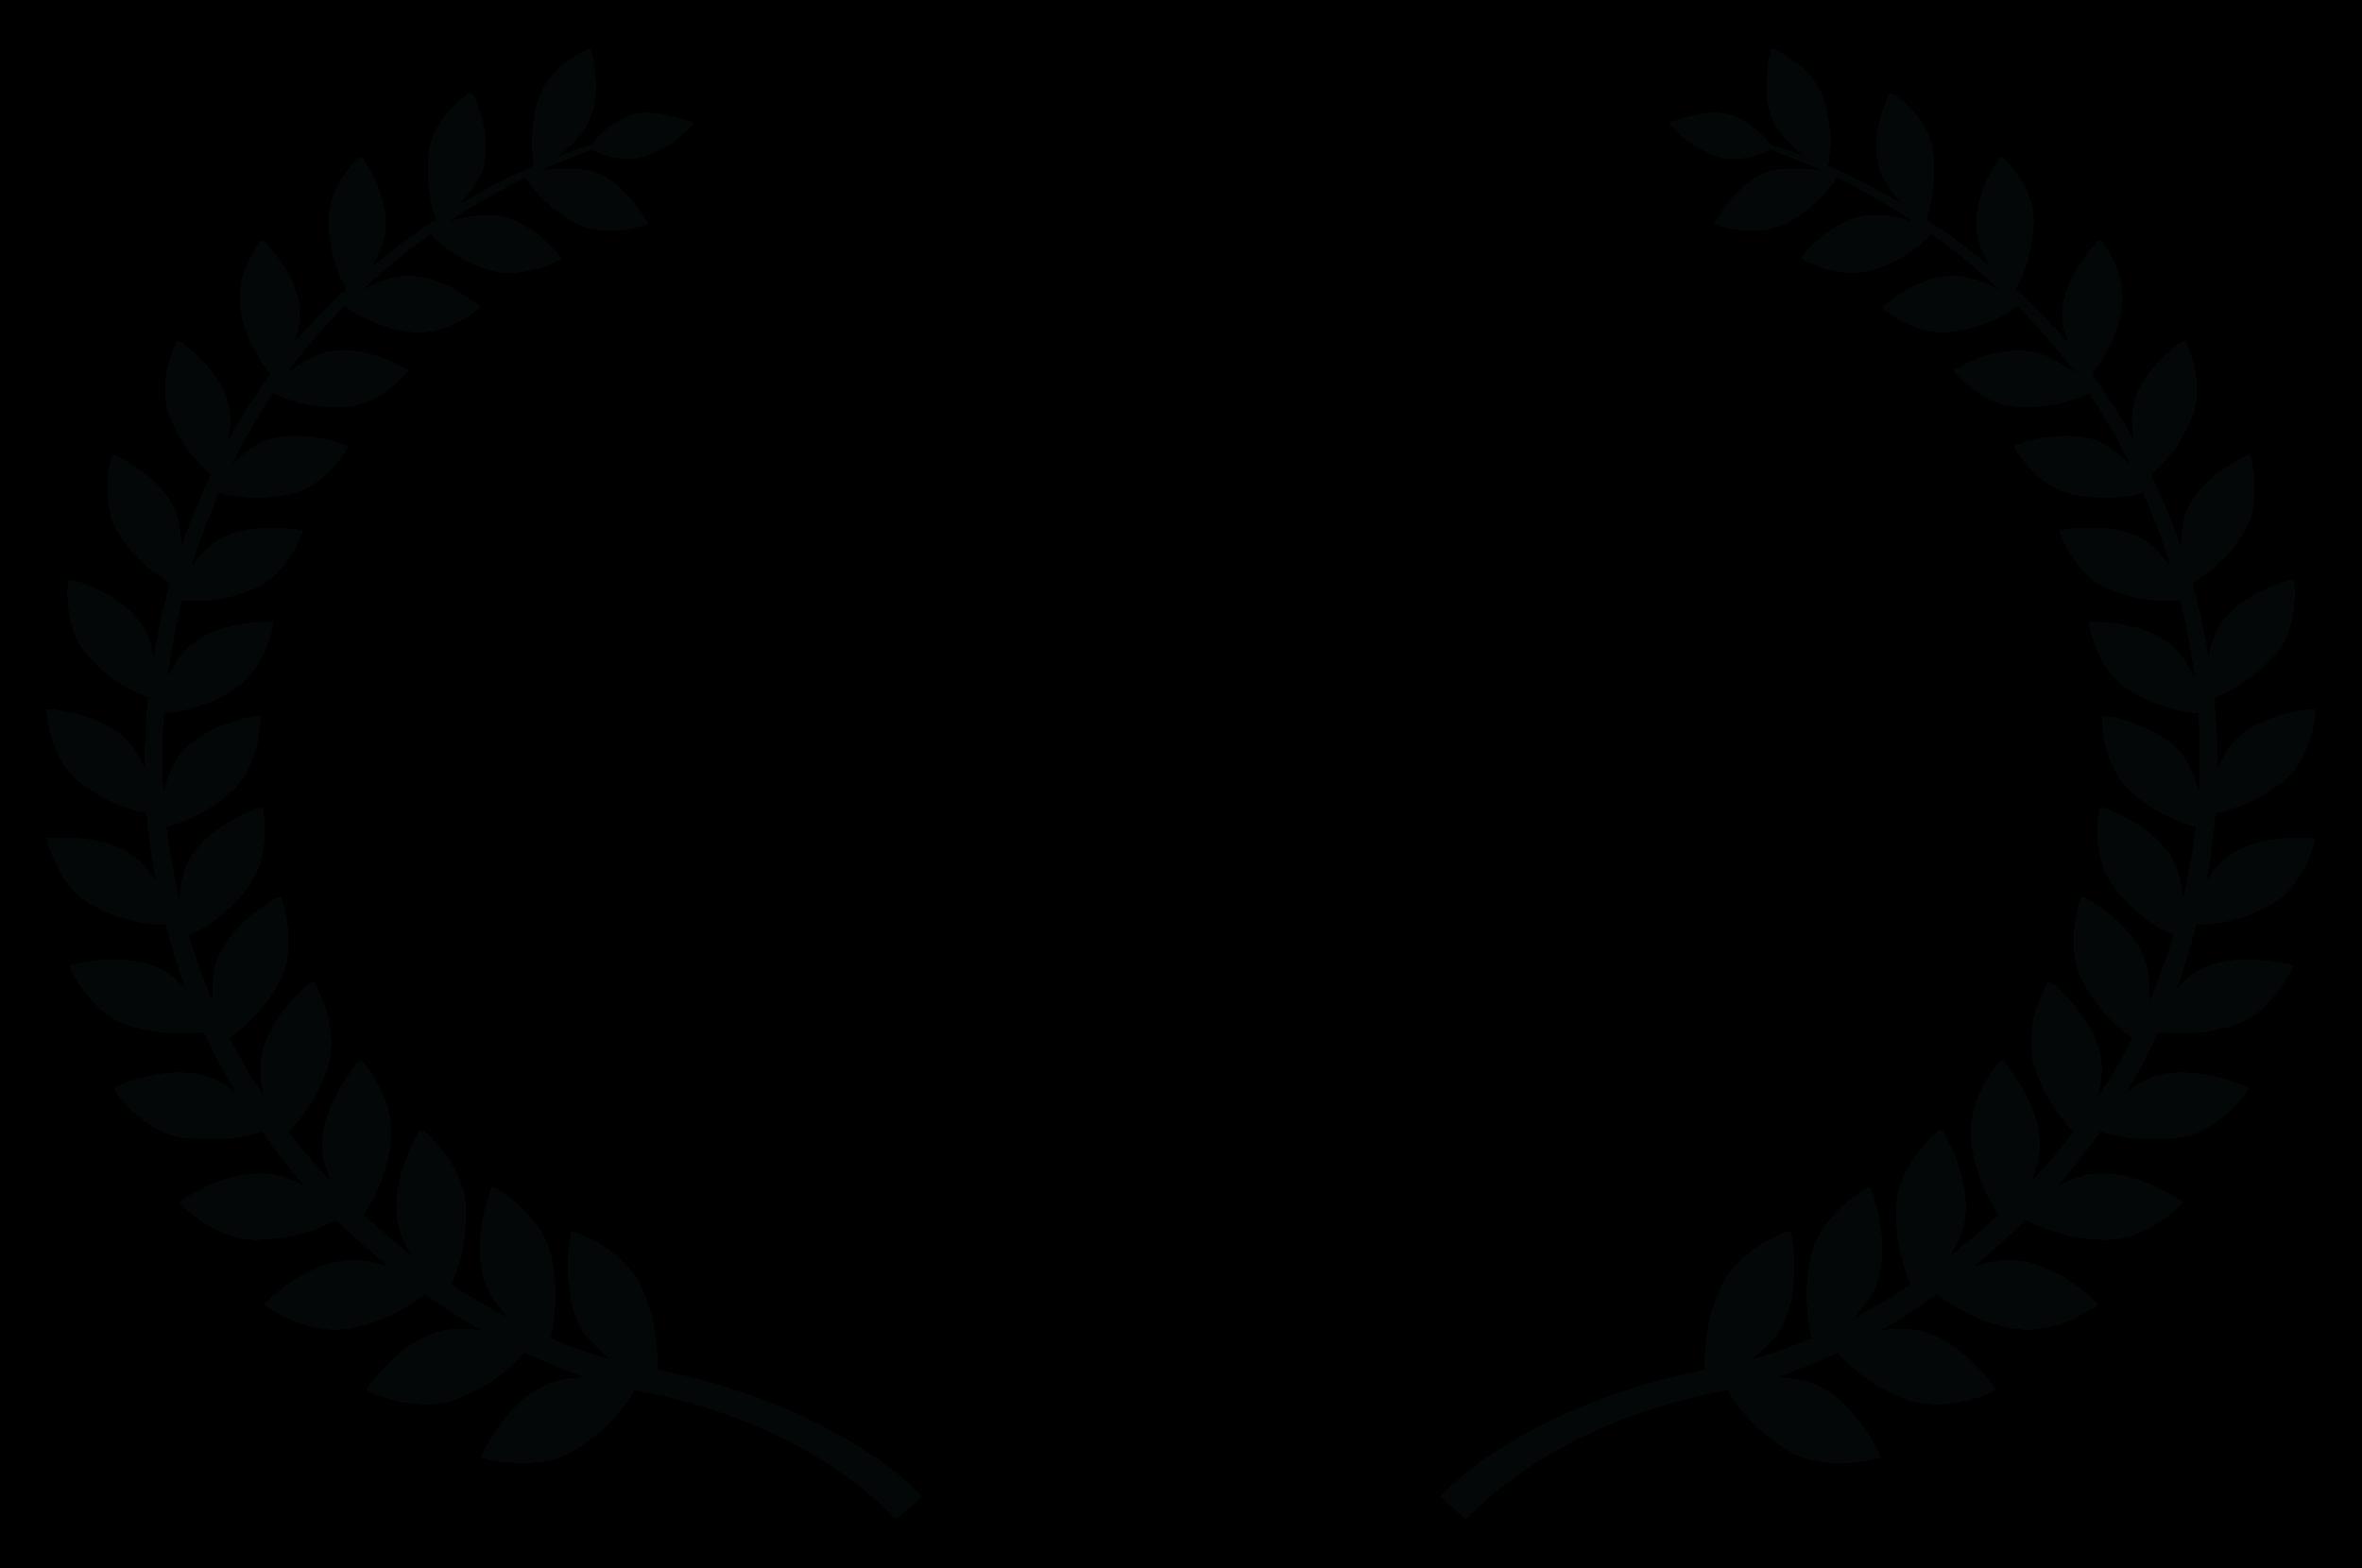 OFFICIALSELECTION-GrandRapidsFeministFilmFestival-2017.png